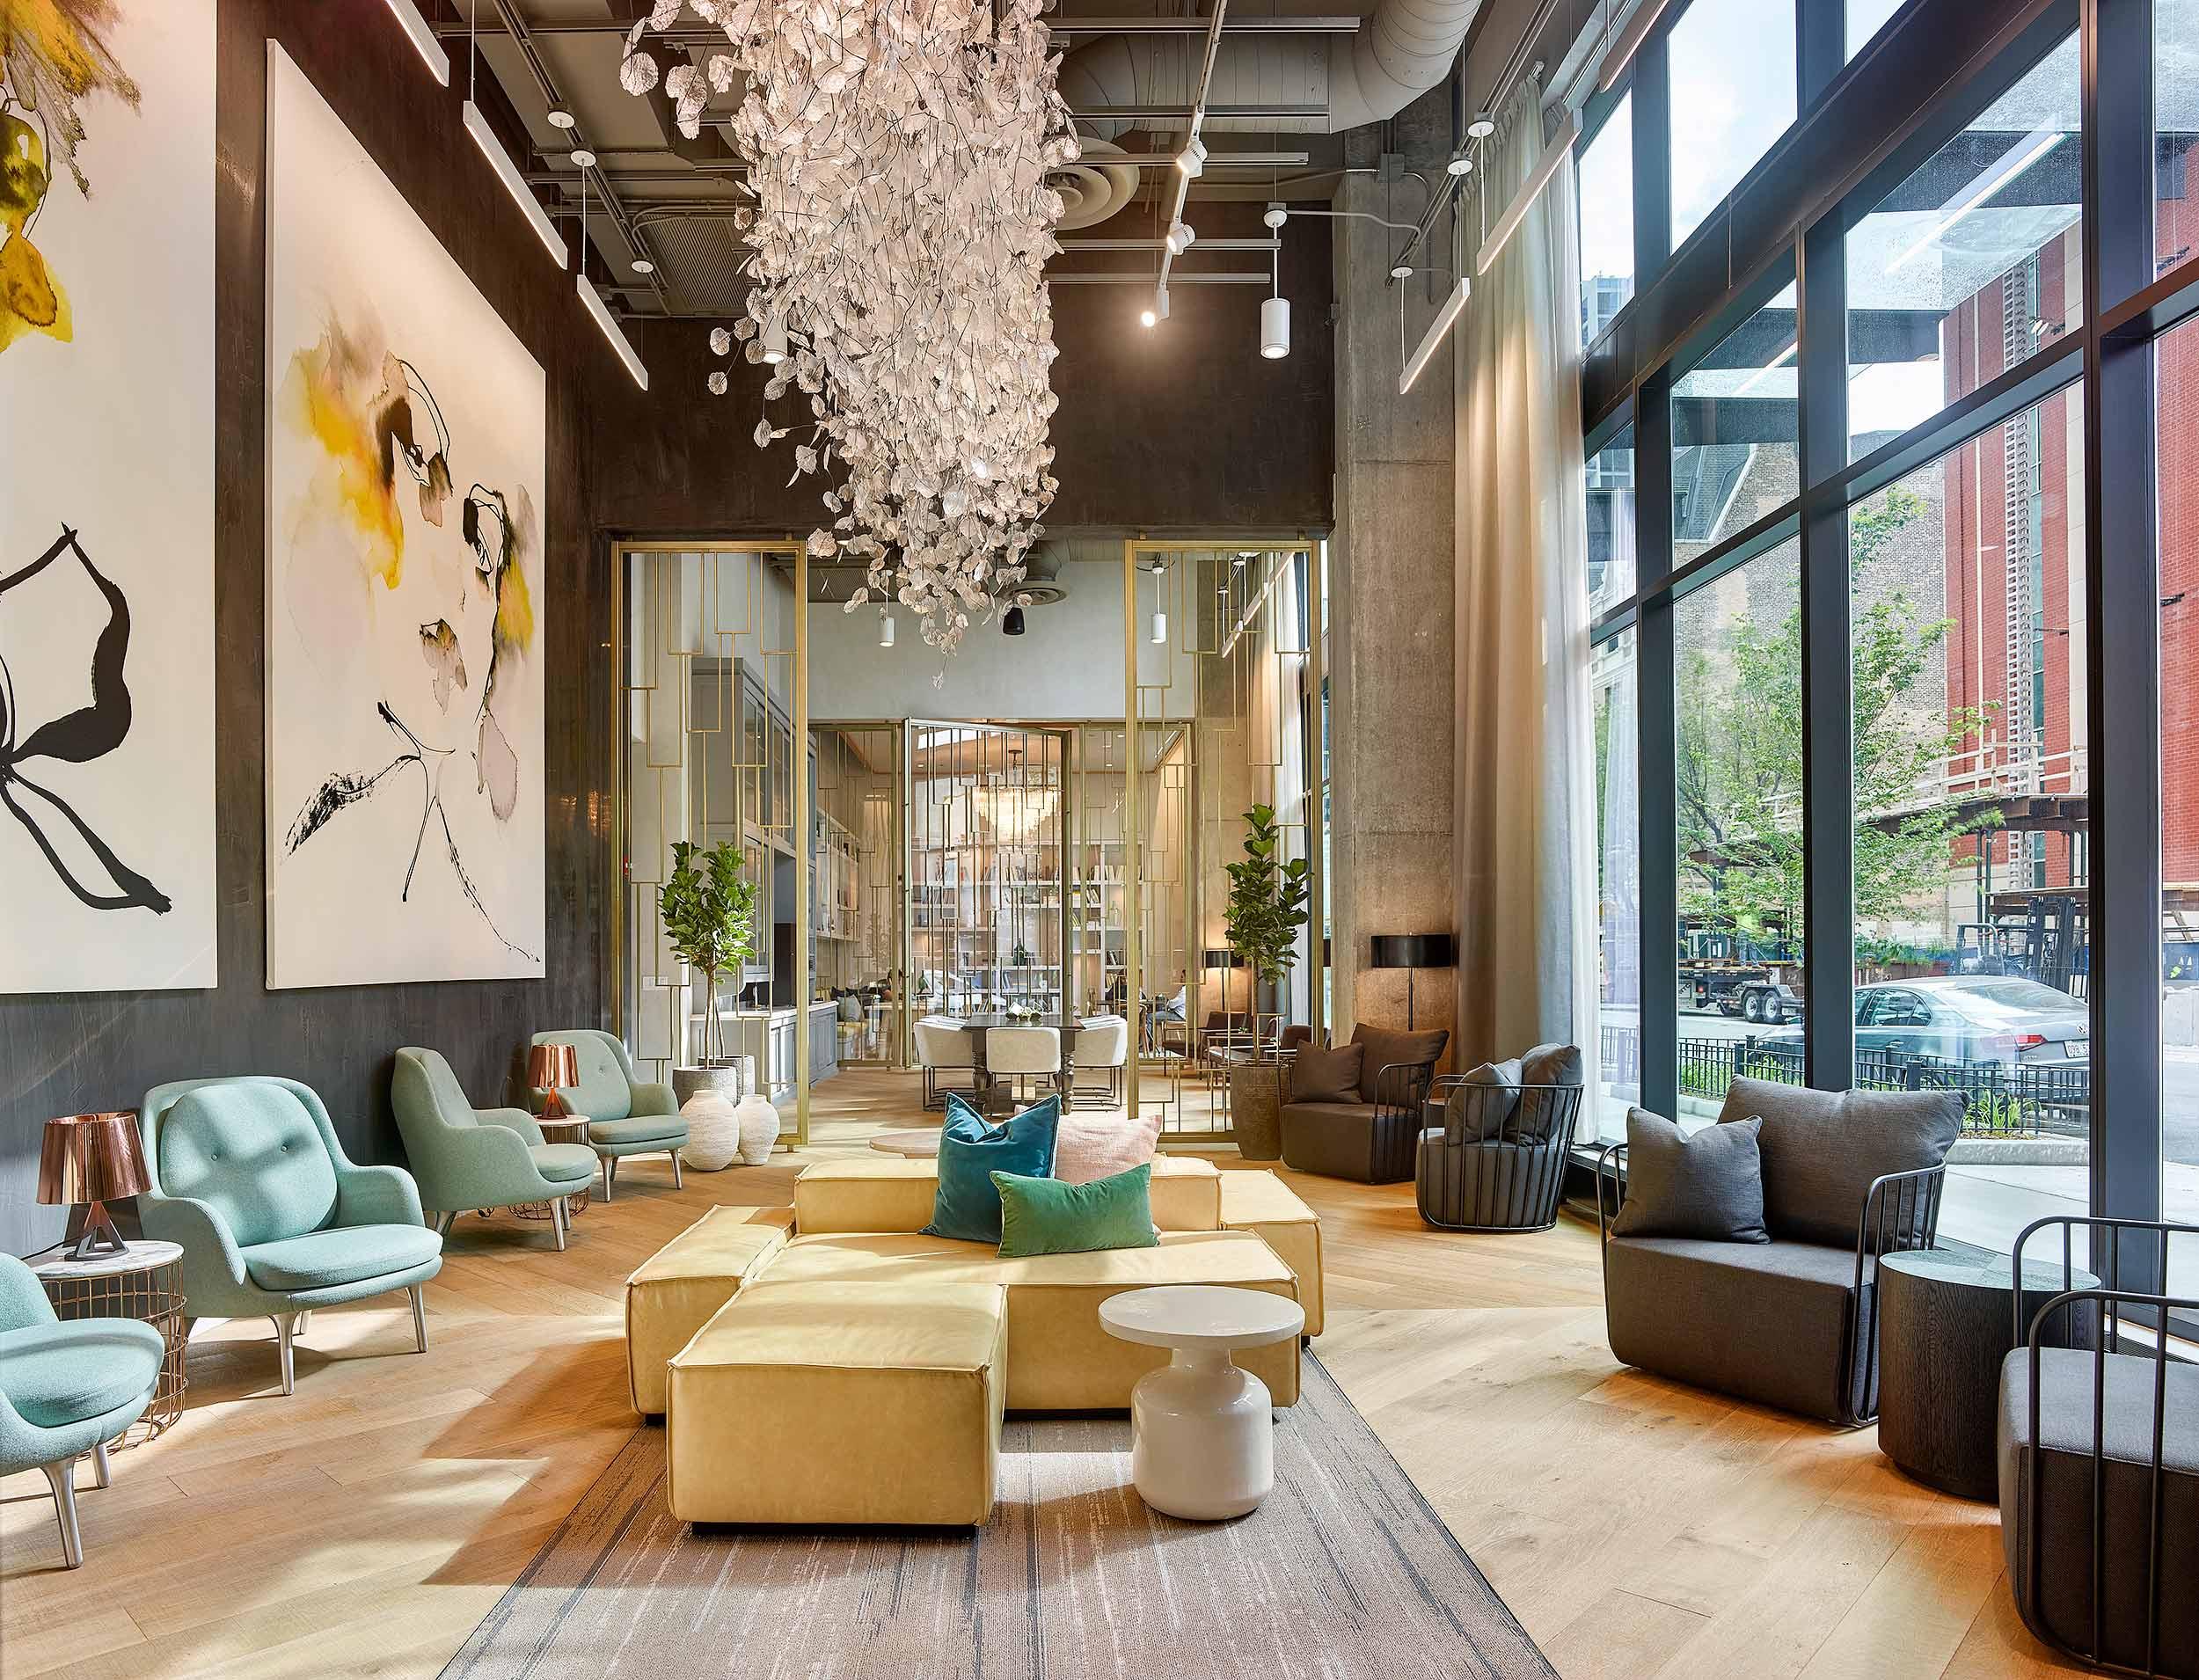 Multi-Story Residential — Jeffrey Totaro | Architectural